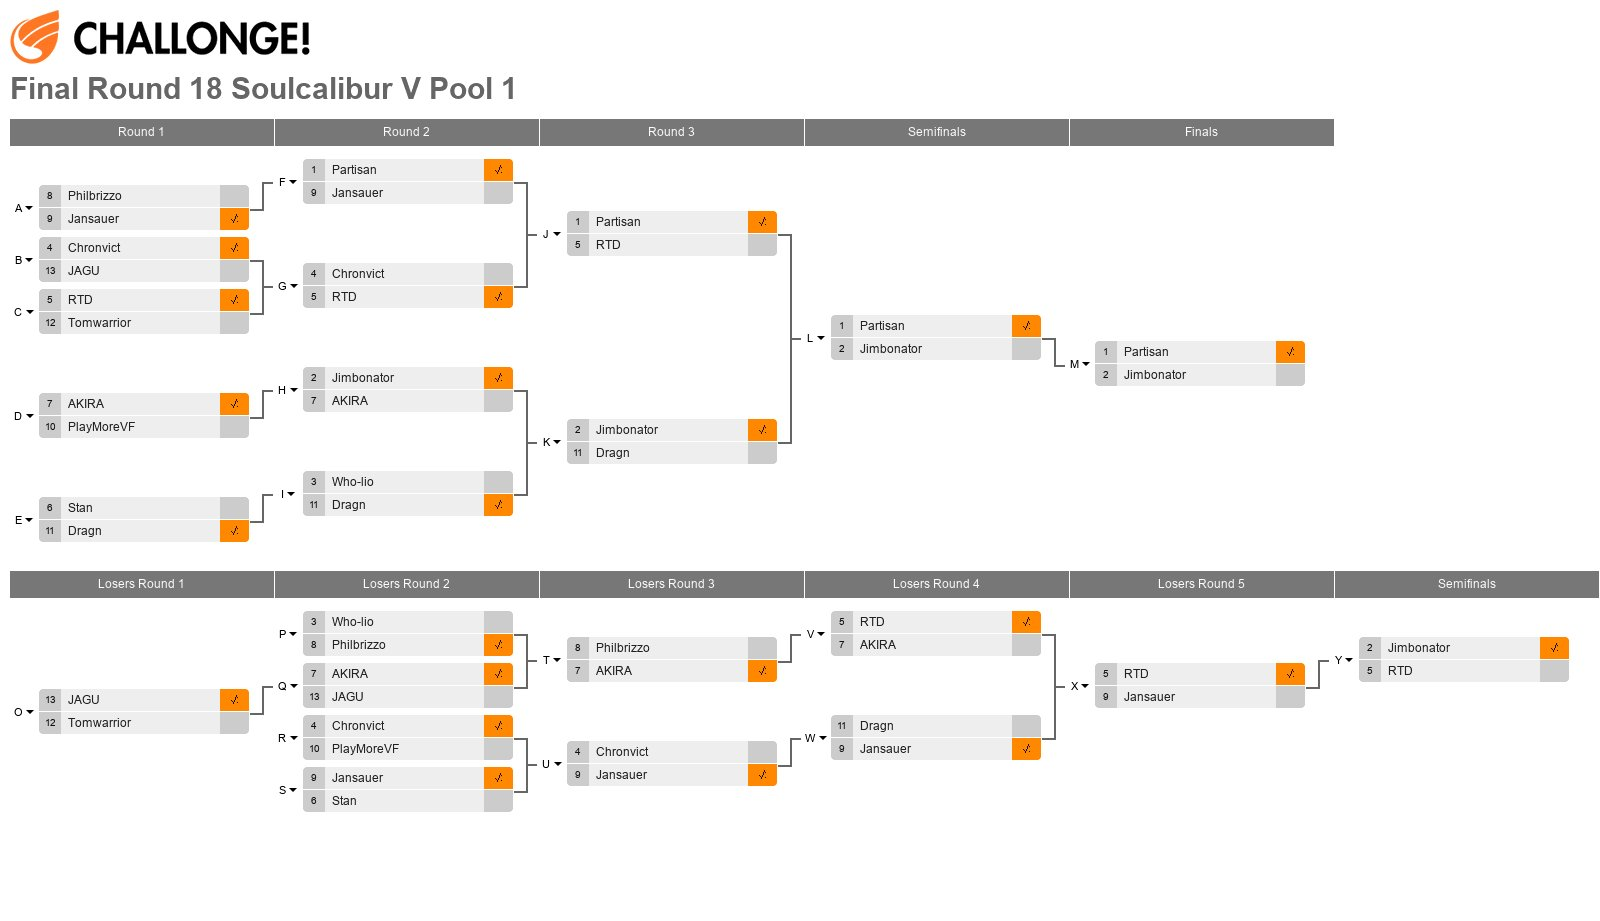 Final Round 18 Soulcalibur V Pool 1